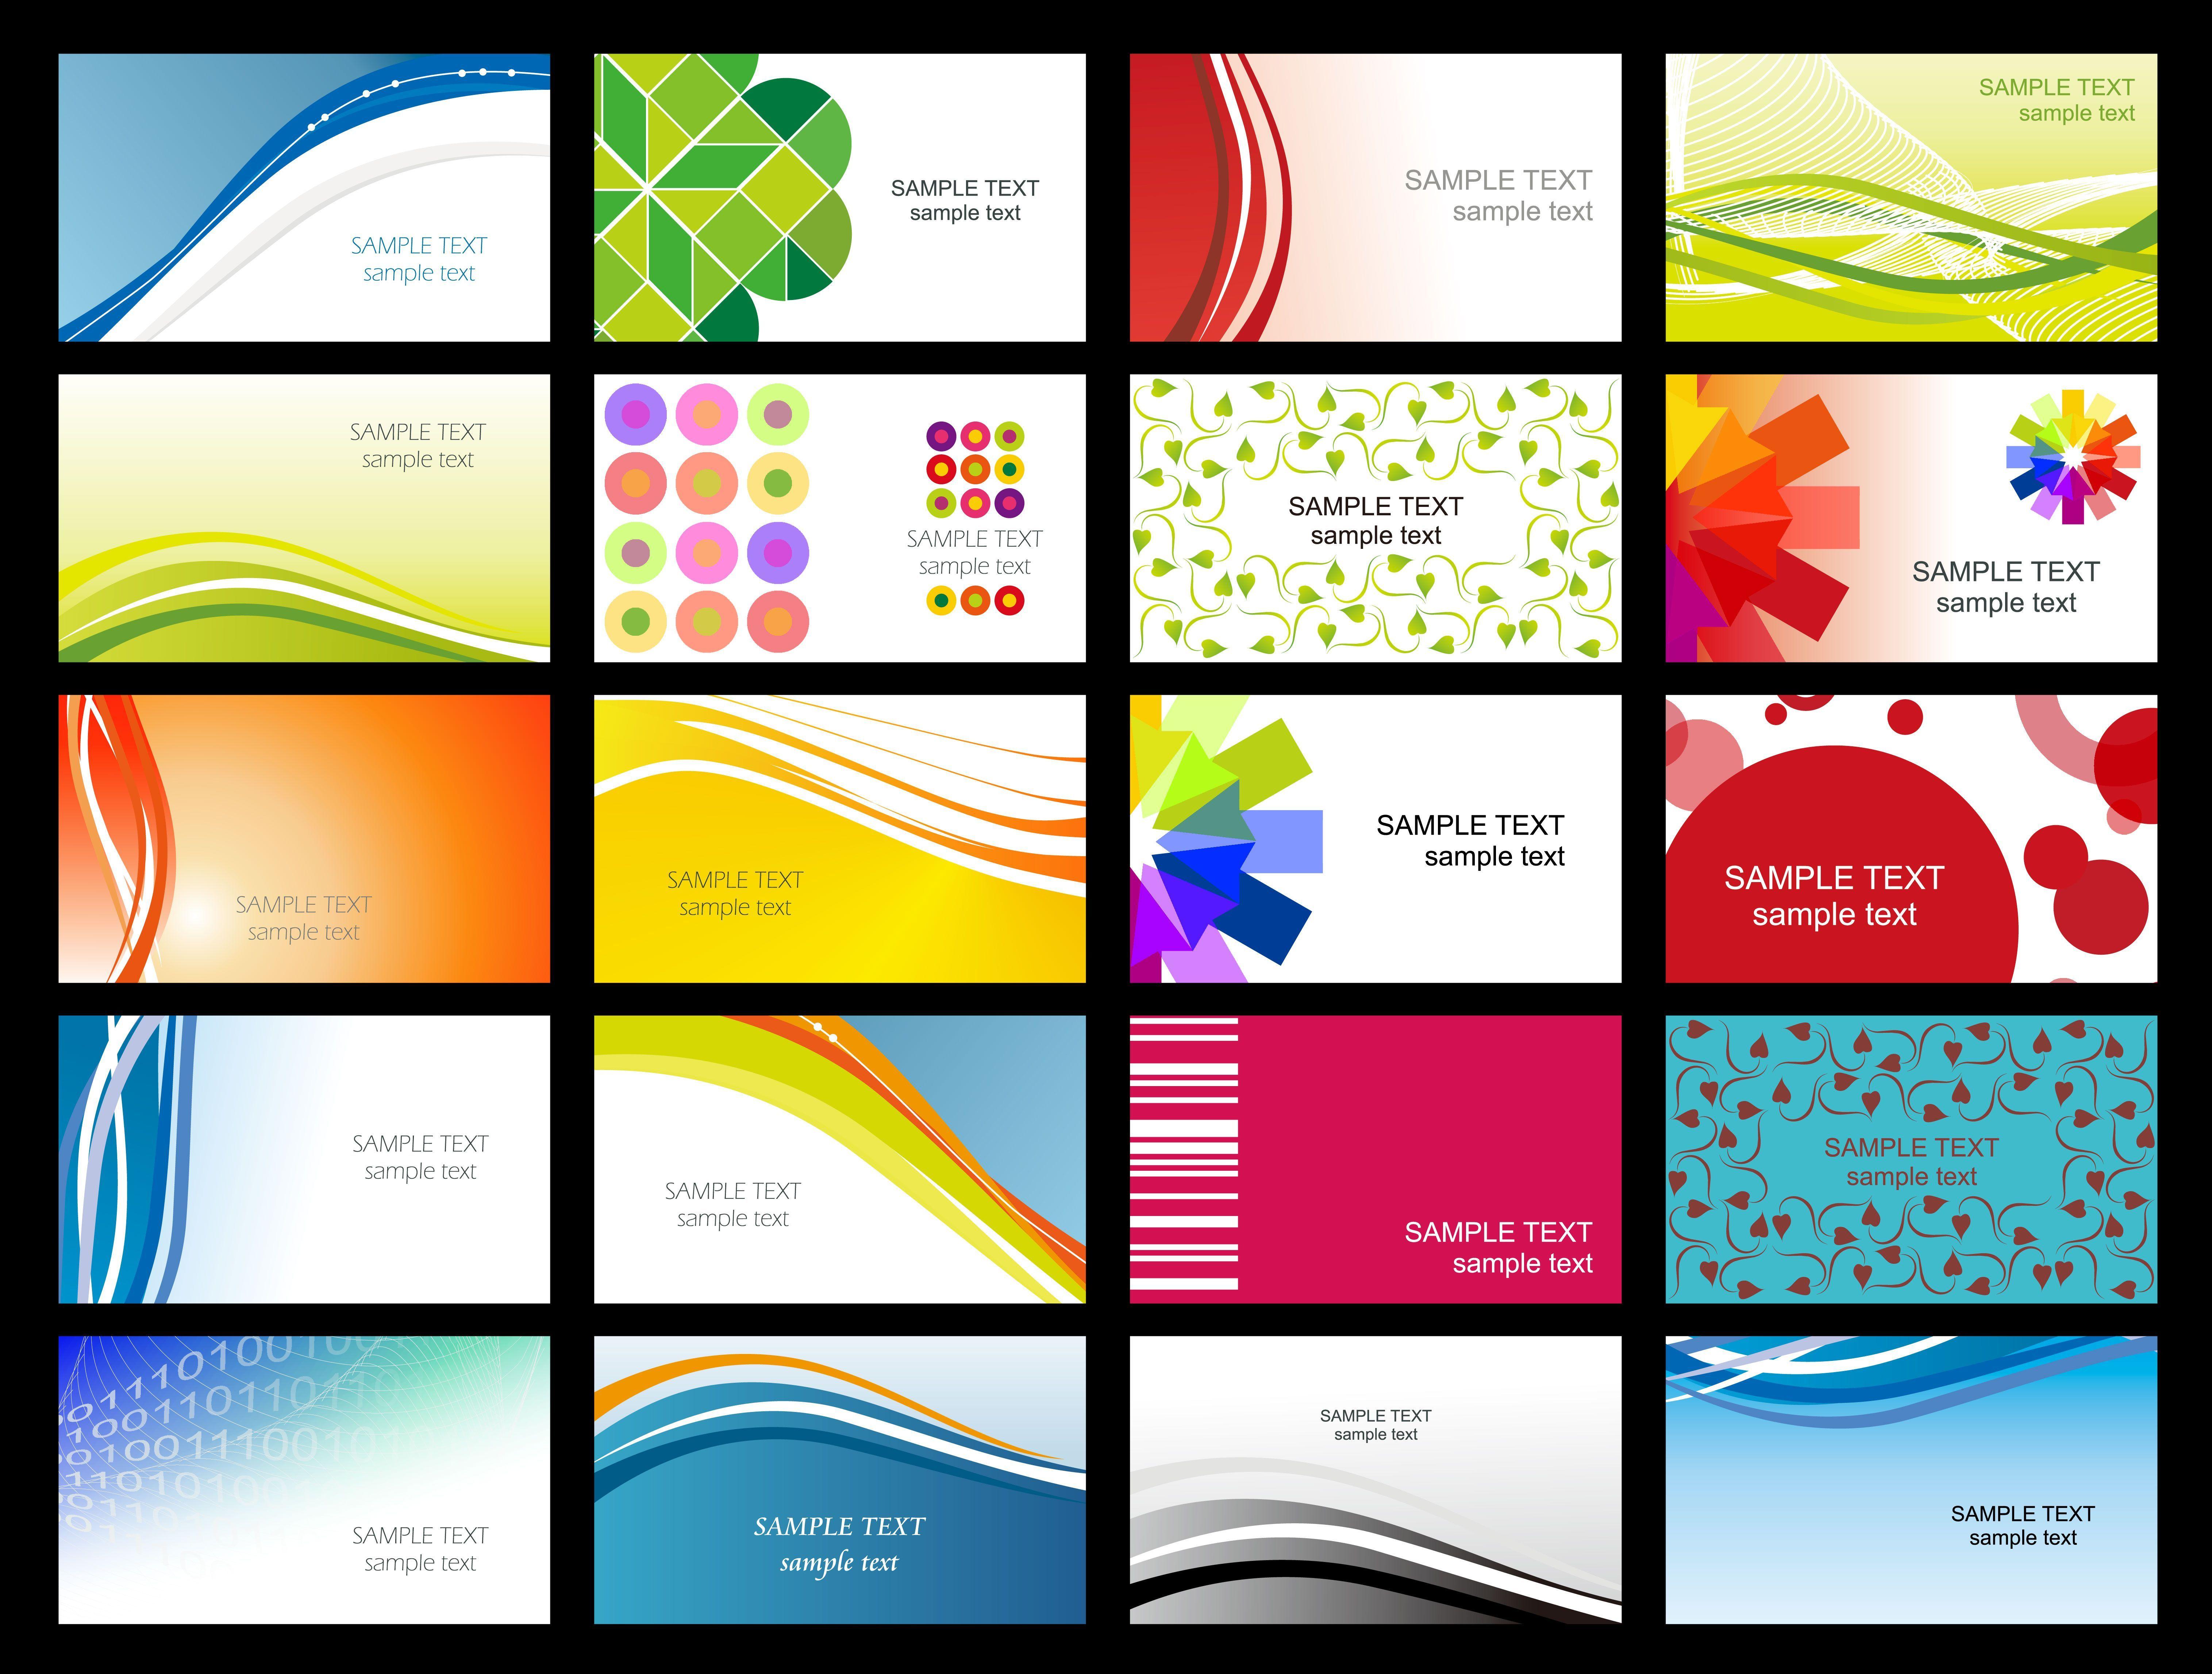 Pinanggunstore On Business Cardsbusinesscardsdesignideas - Free Printable Business Cards Online